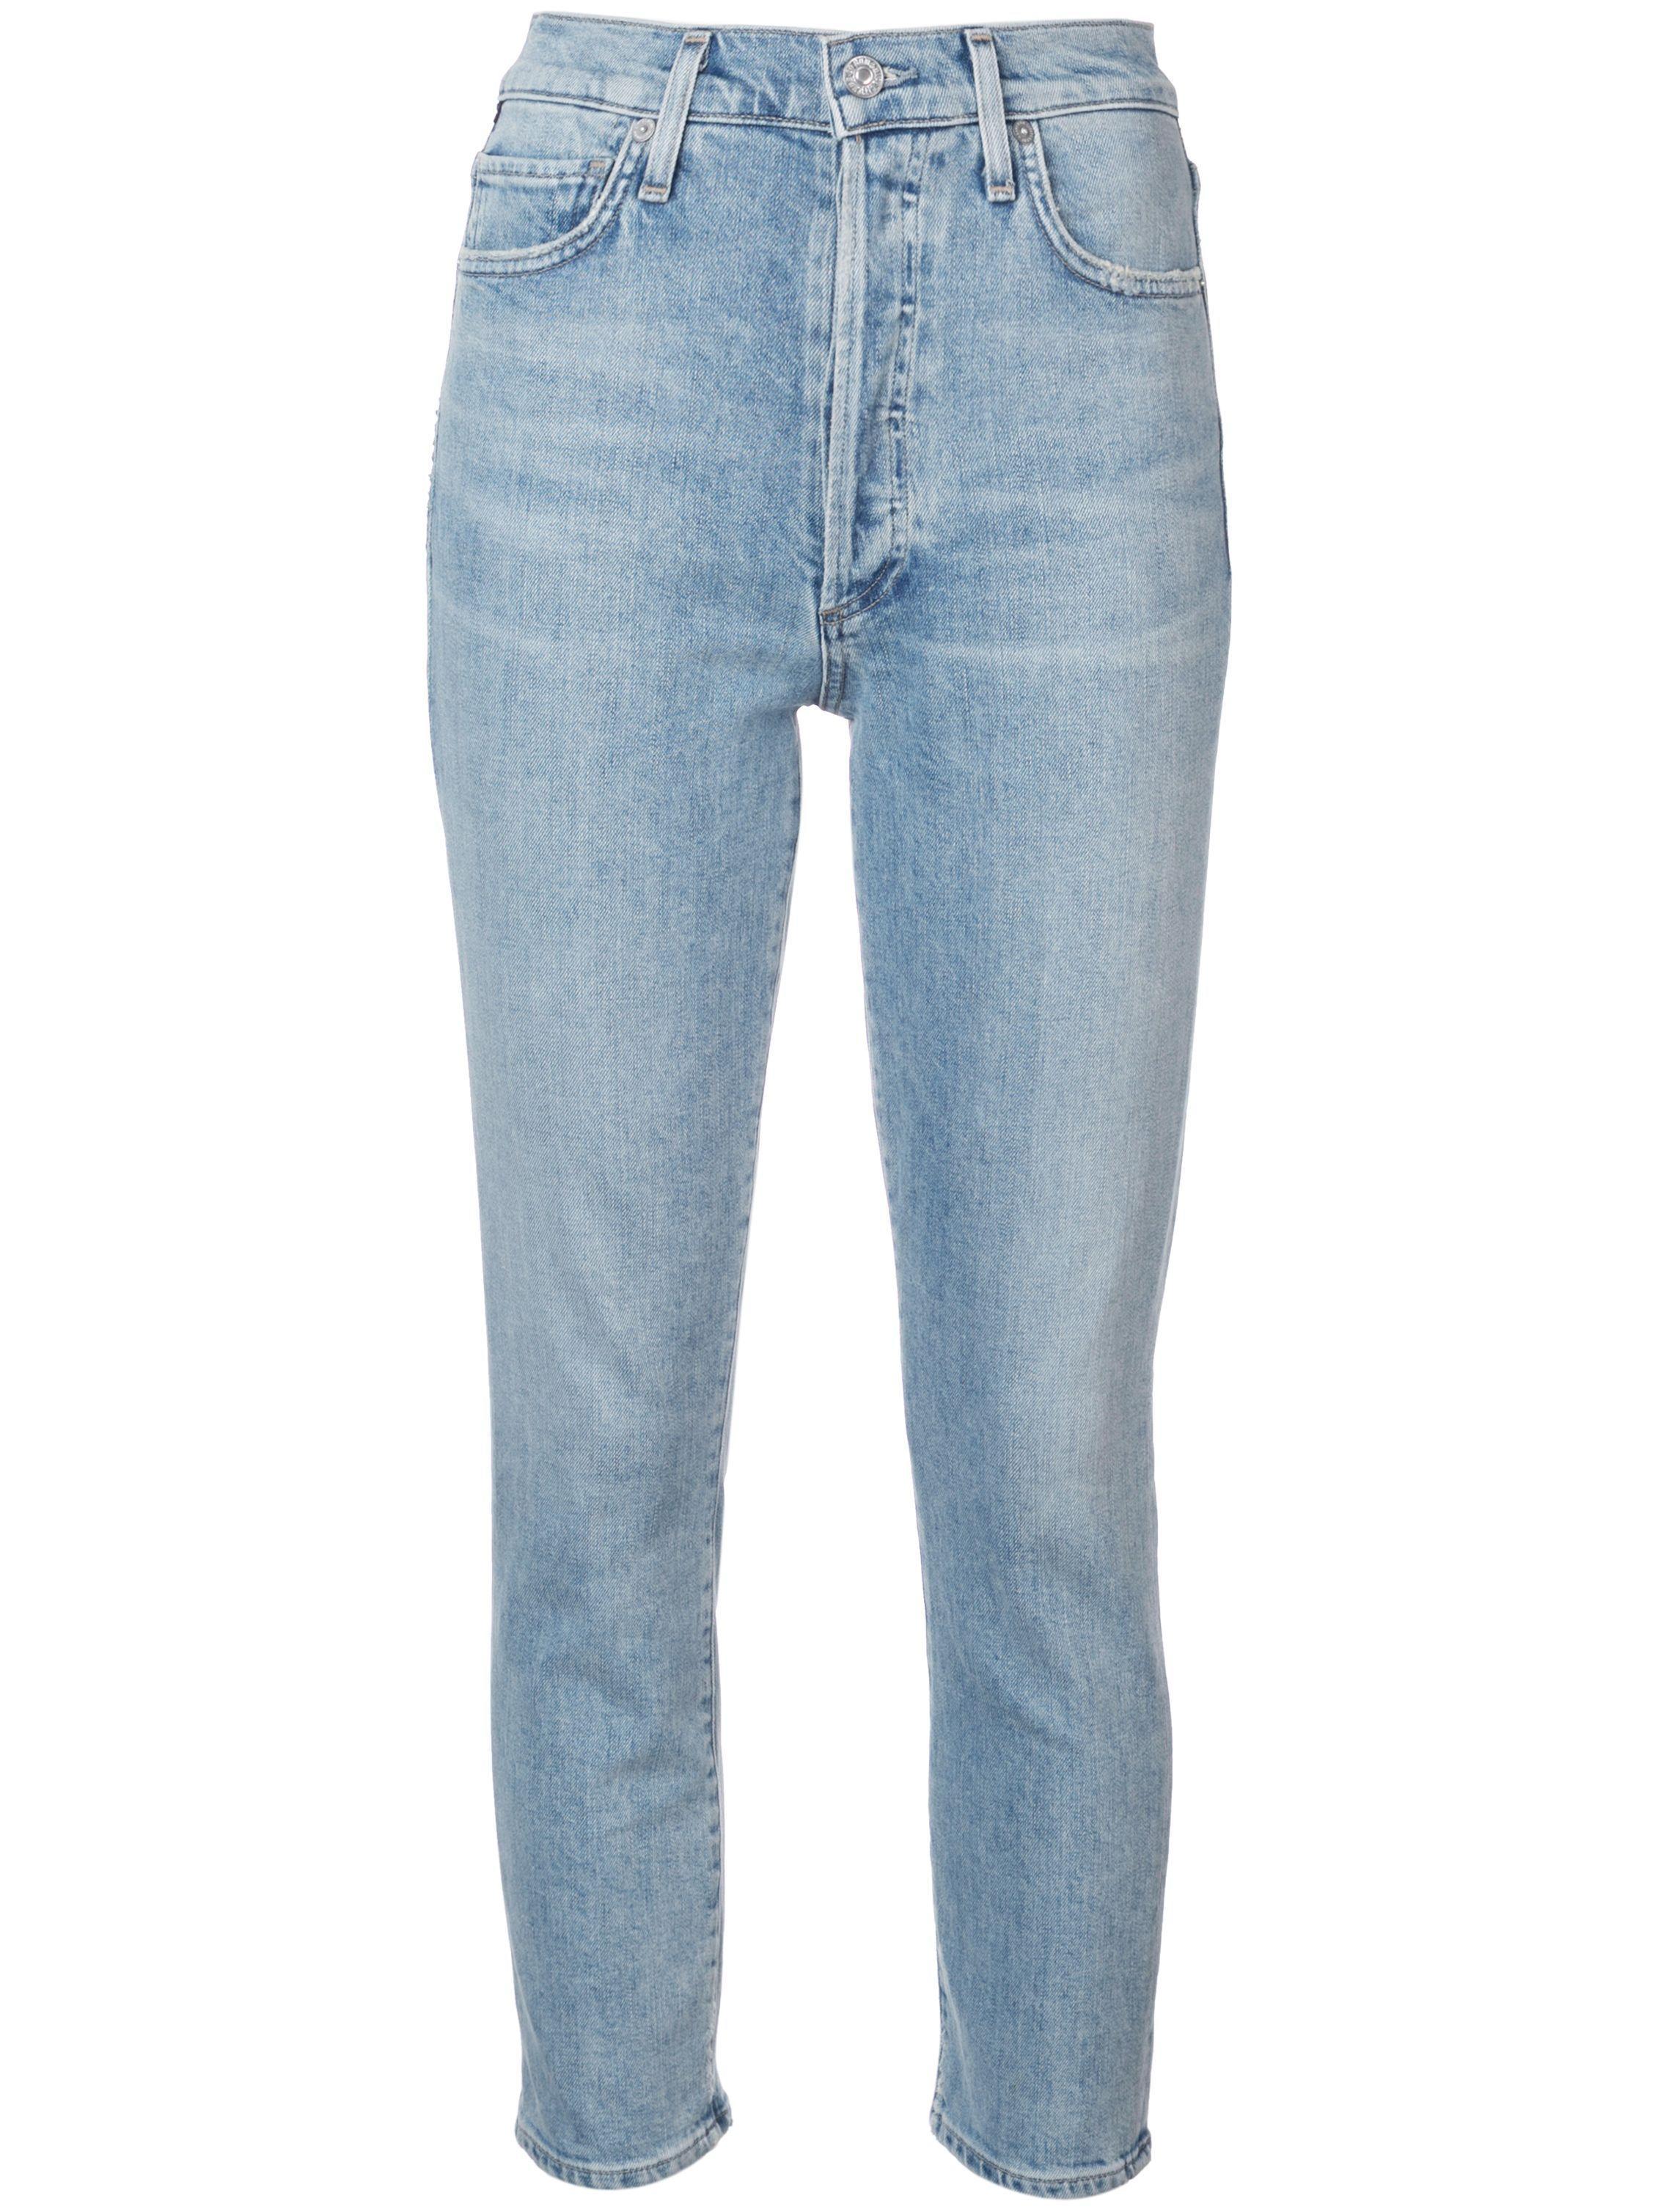 Olivia High Rise Slim Crop With Back Seam Item # 1776-990